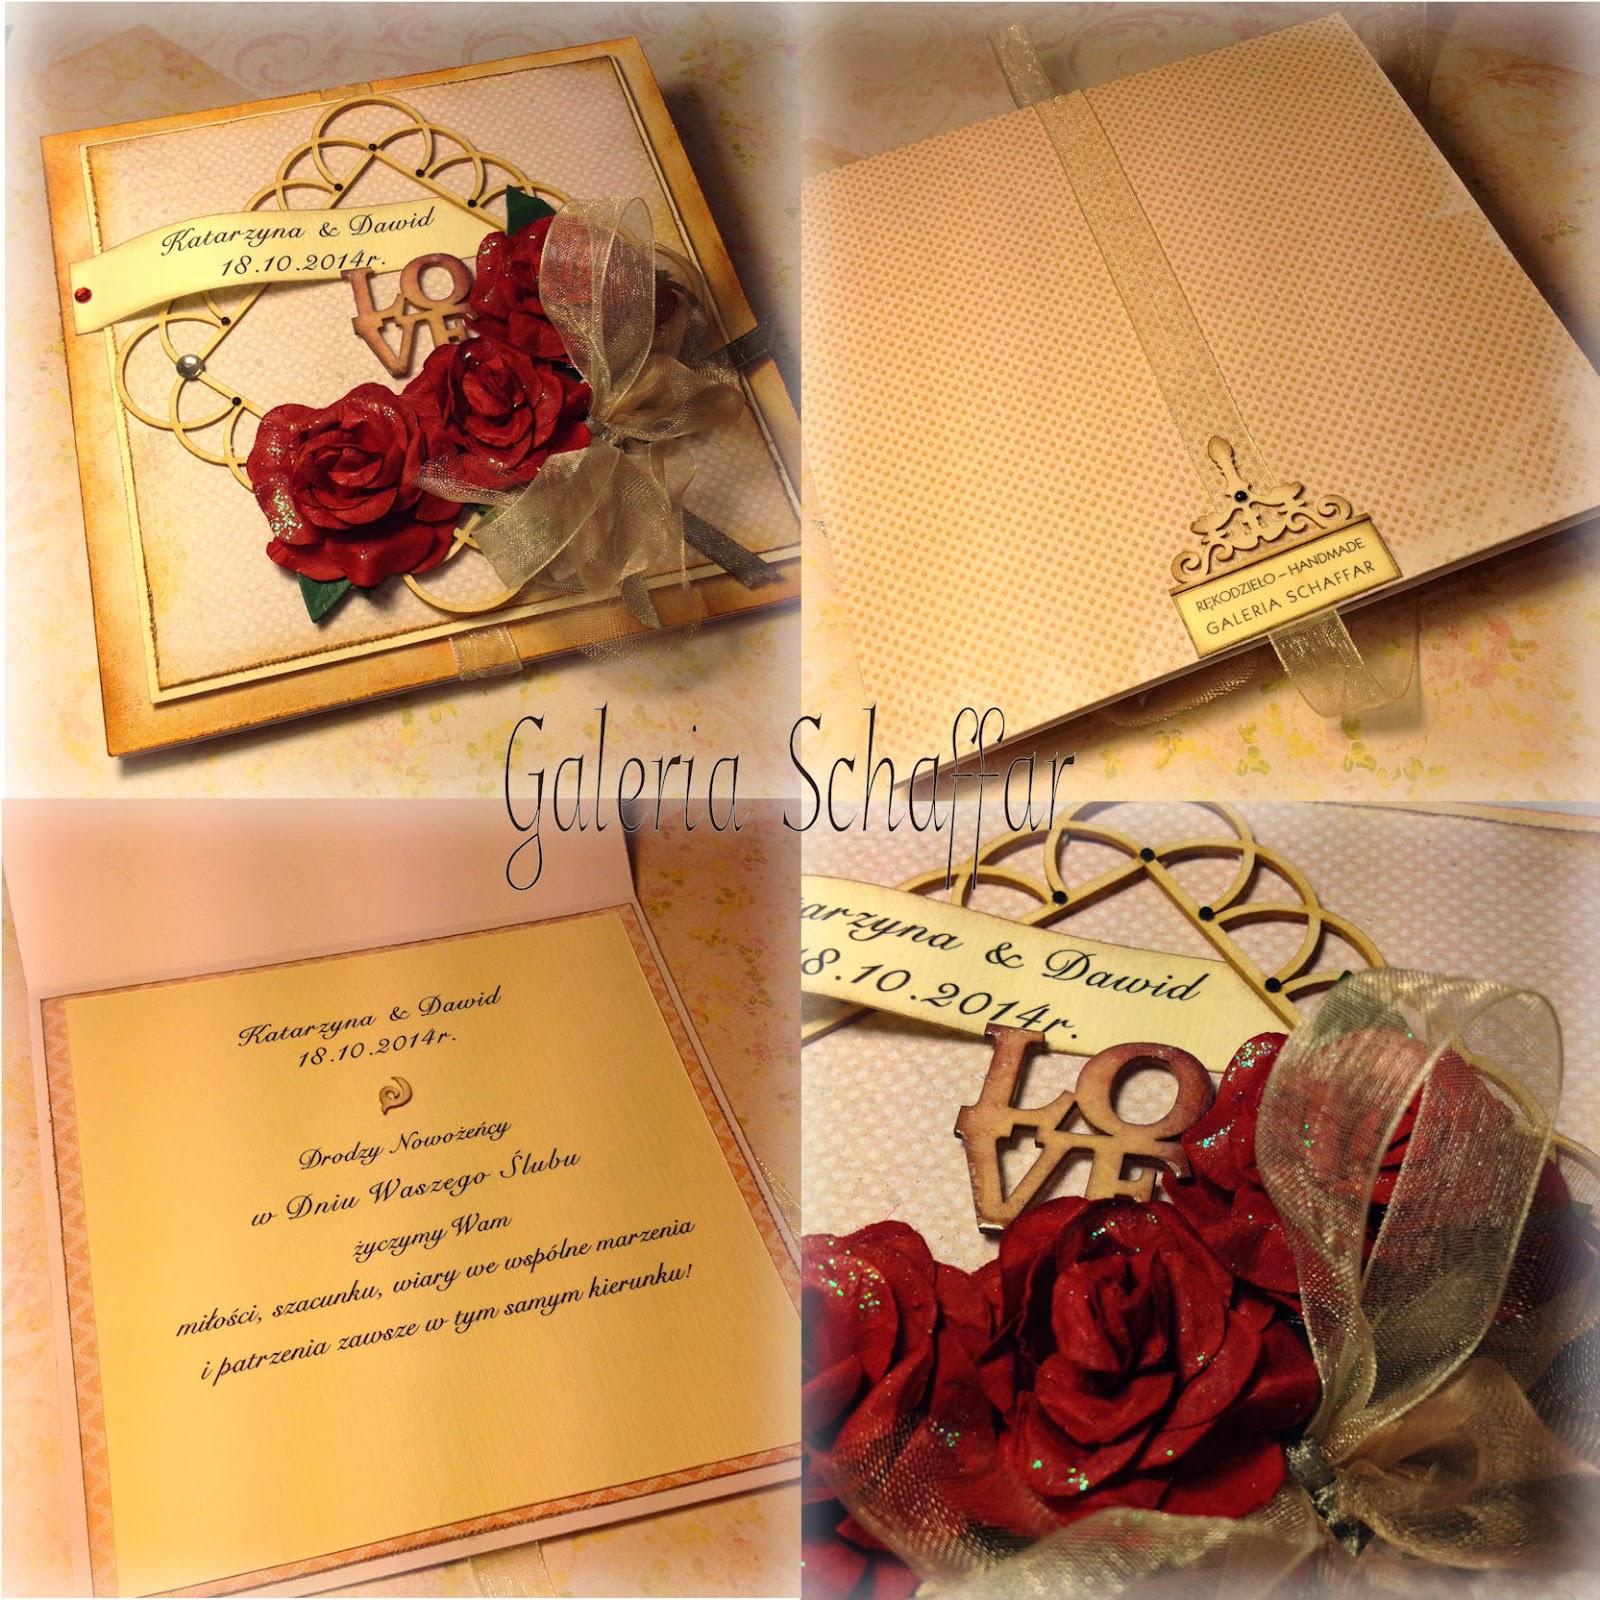 elegancka nietypowa klasyczna kartka na ślub galeria schaffar